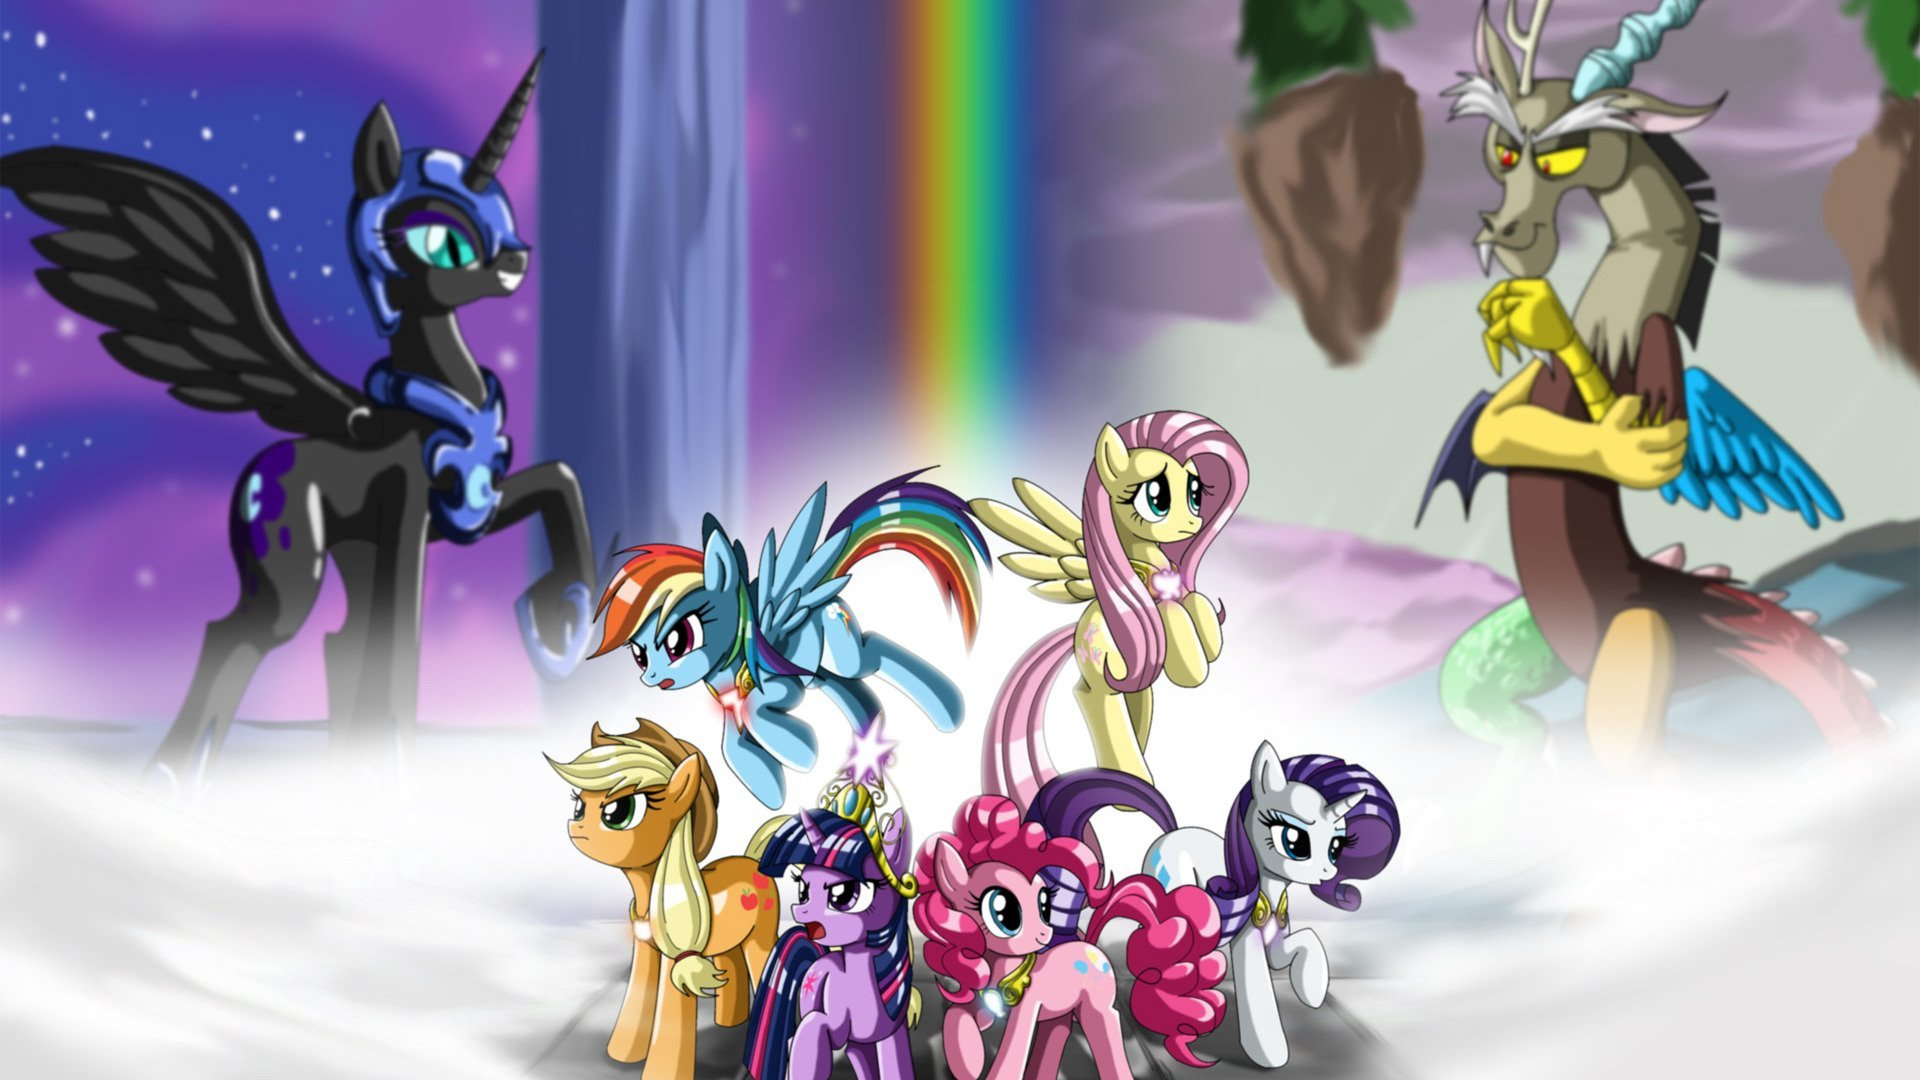 Free Download My Little Pony Friendship Is Magic Wallpaper Hd